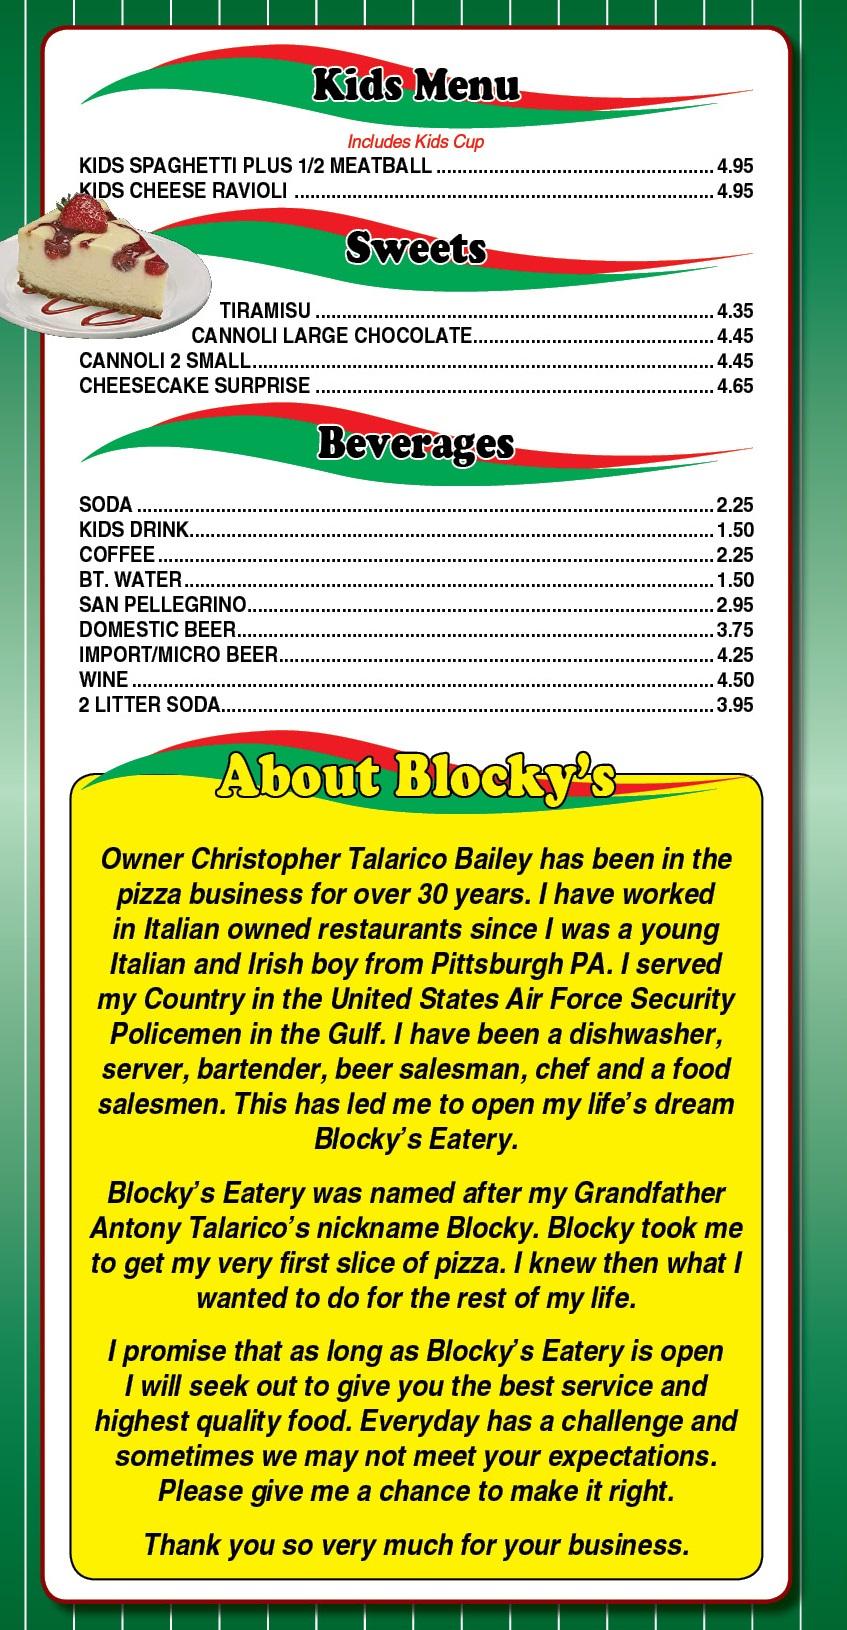 Blocky's Eatery menu4